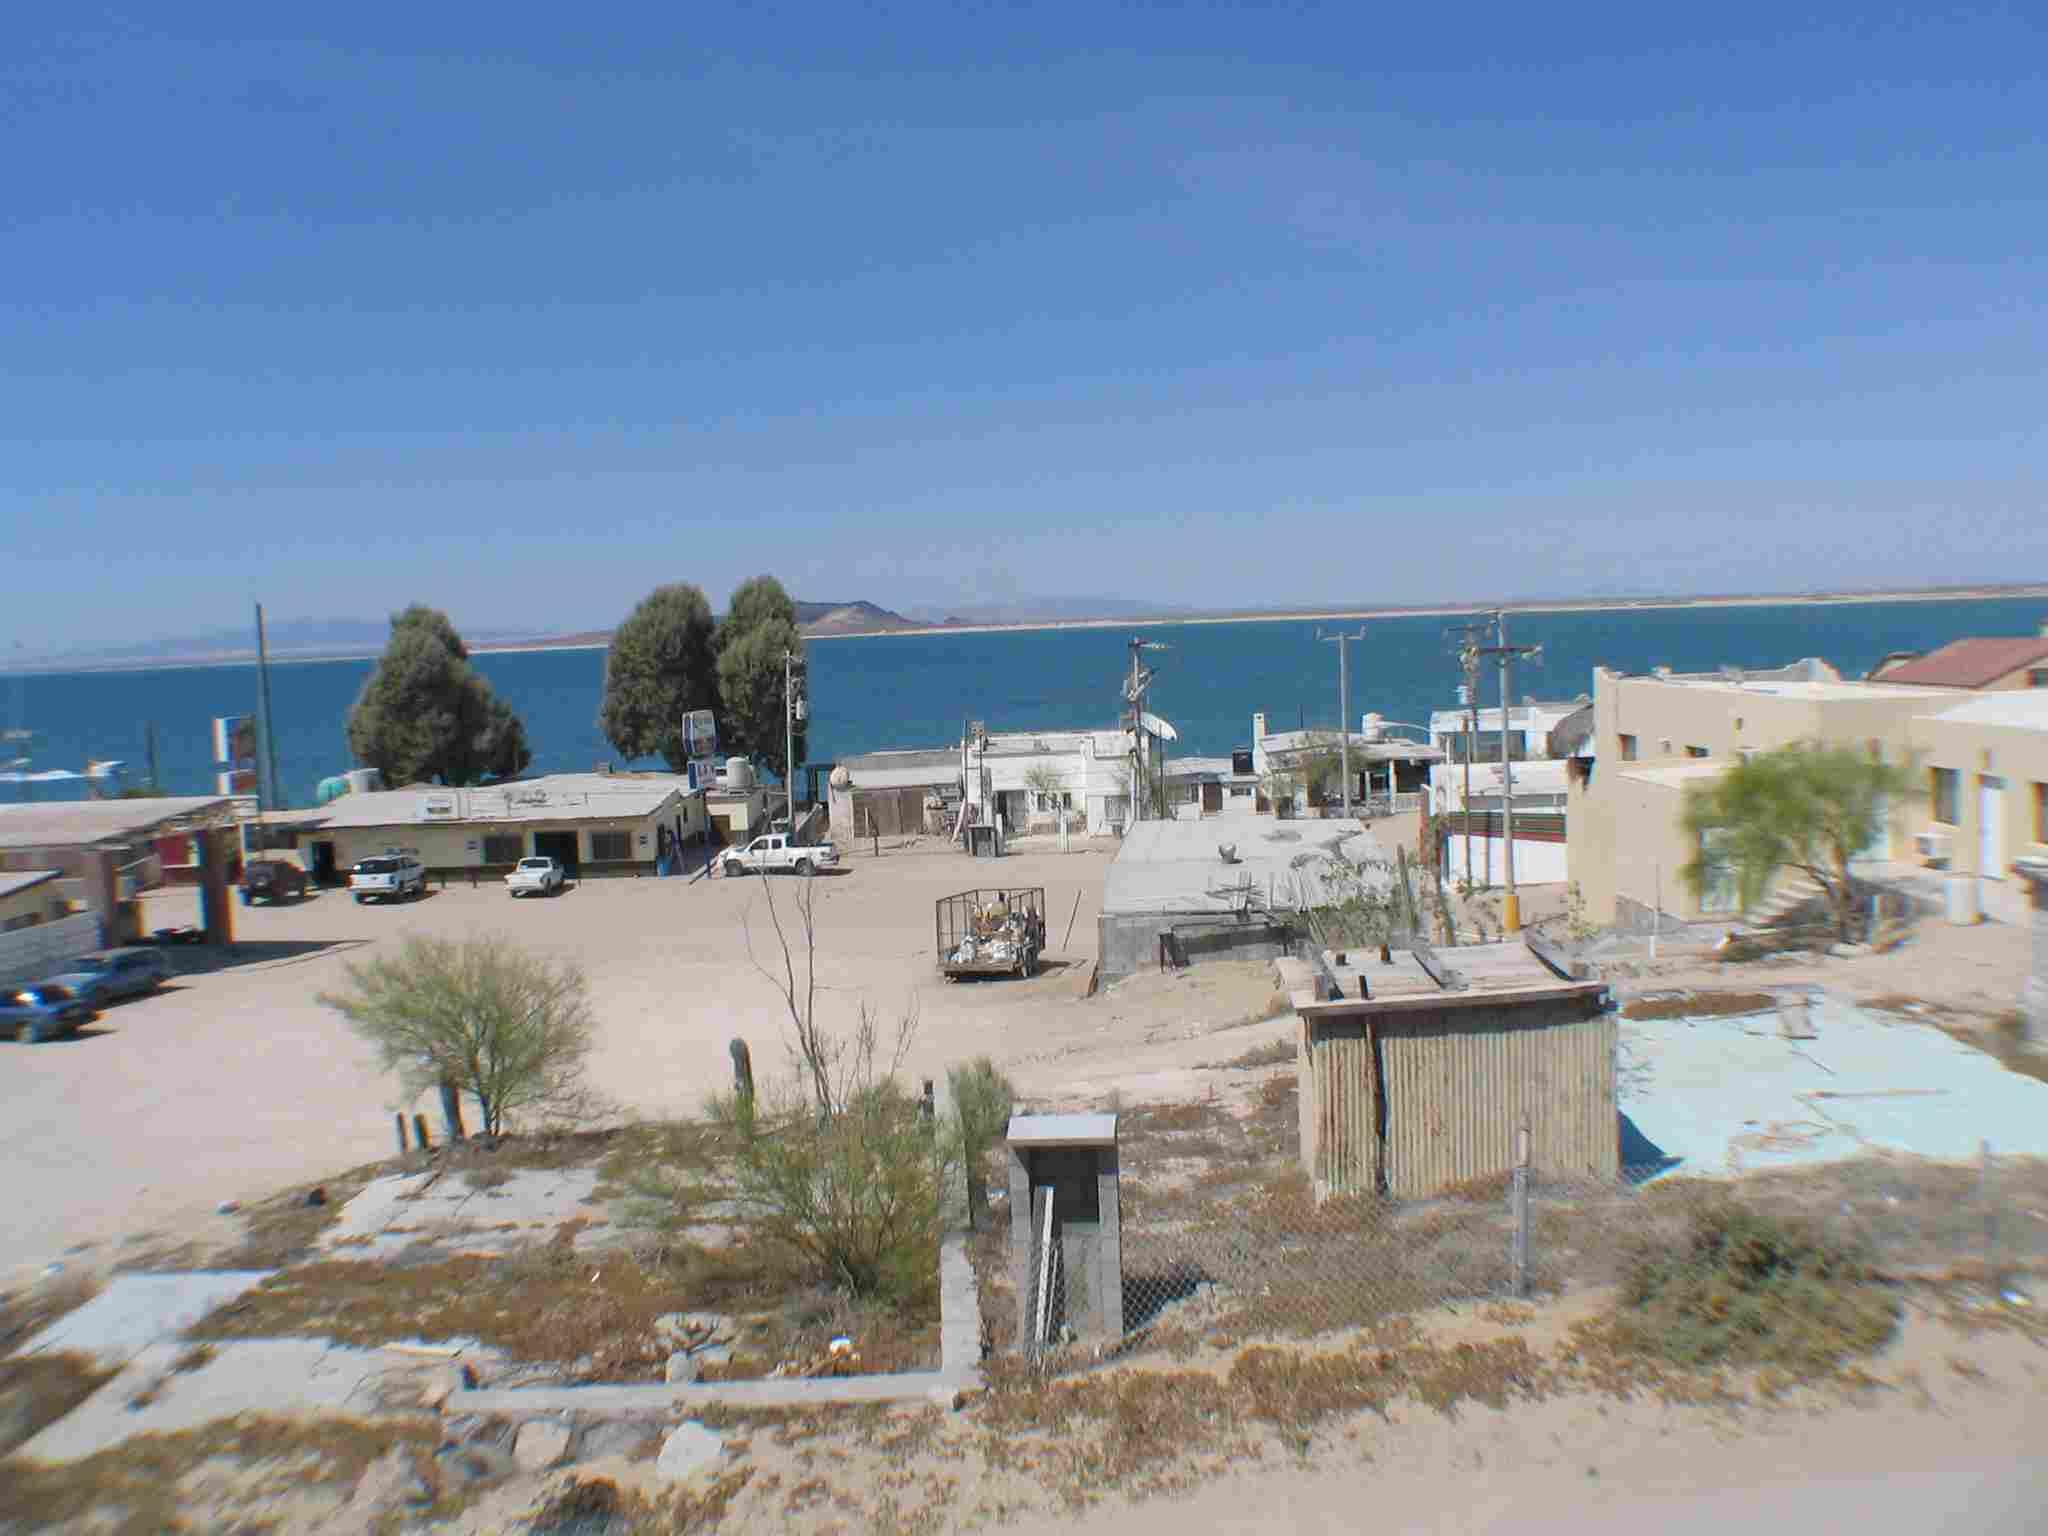 Cholla Bay Rocky Point Mexico Puerto Penasco Condos Homes And Hotels